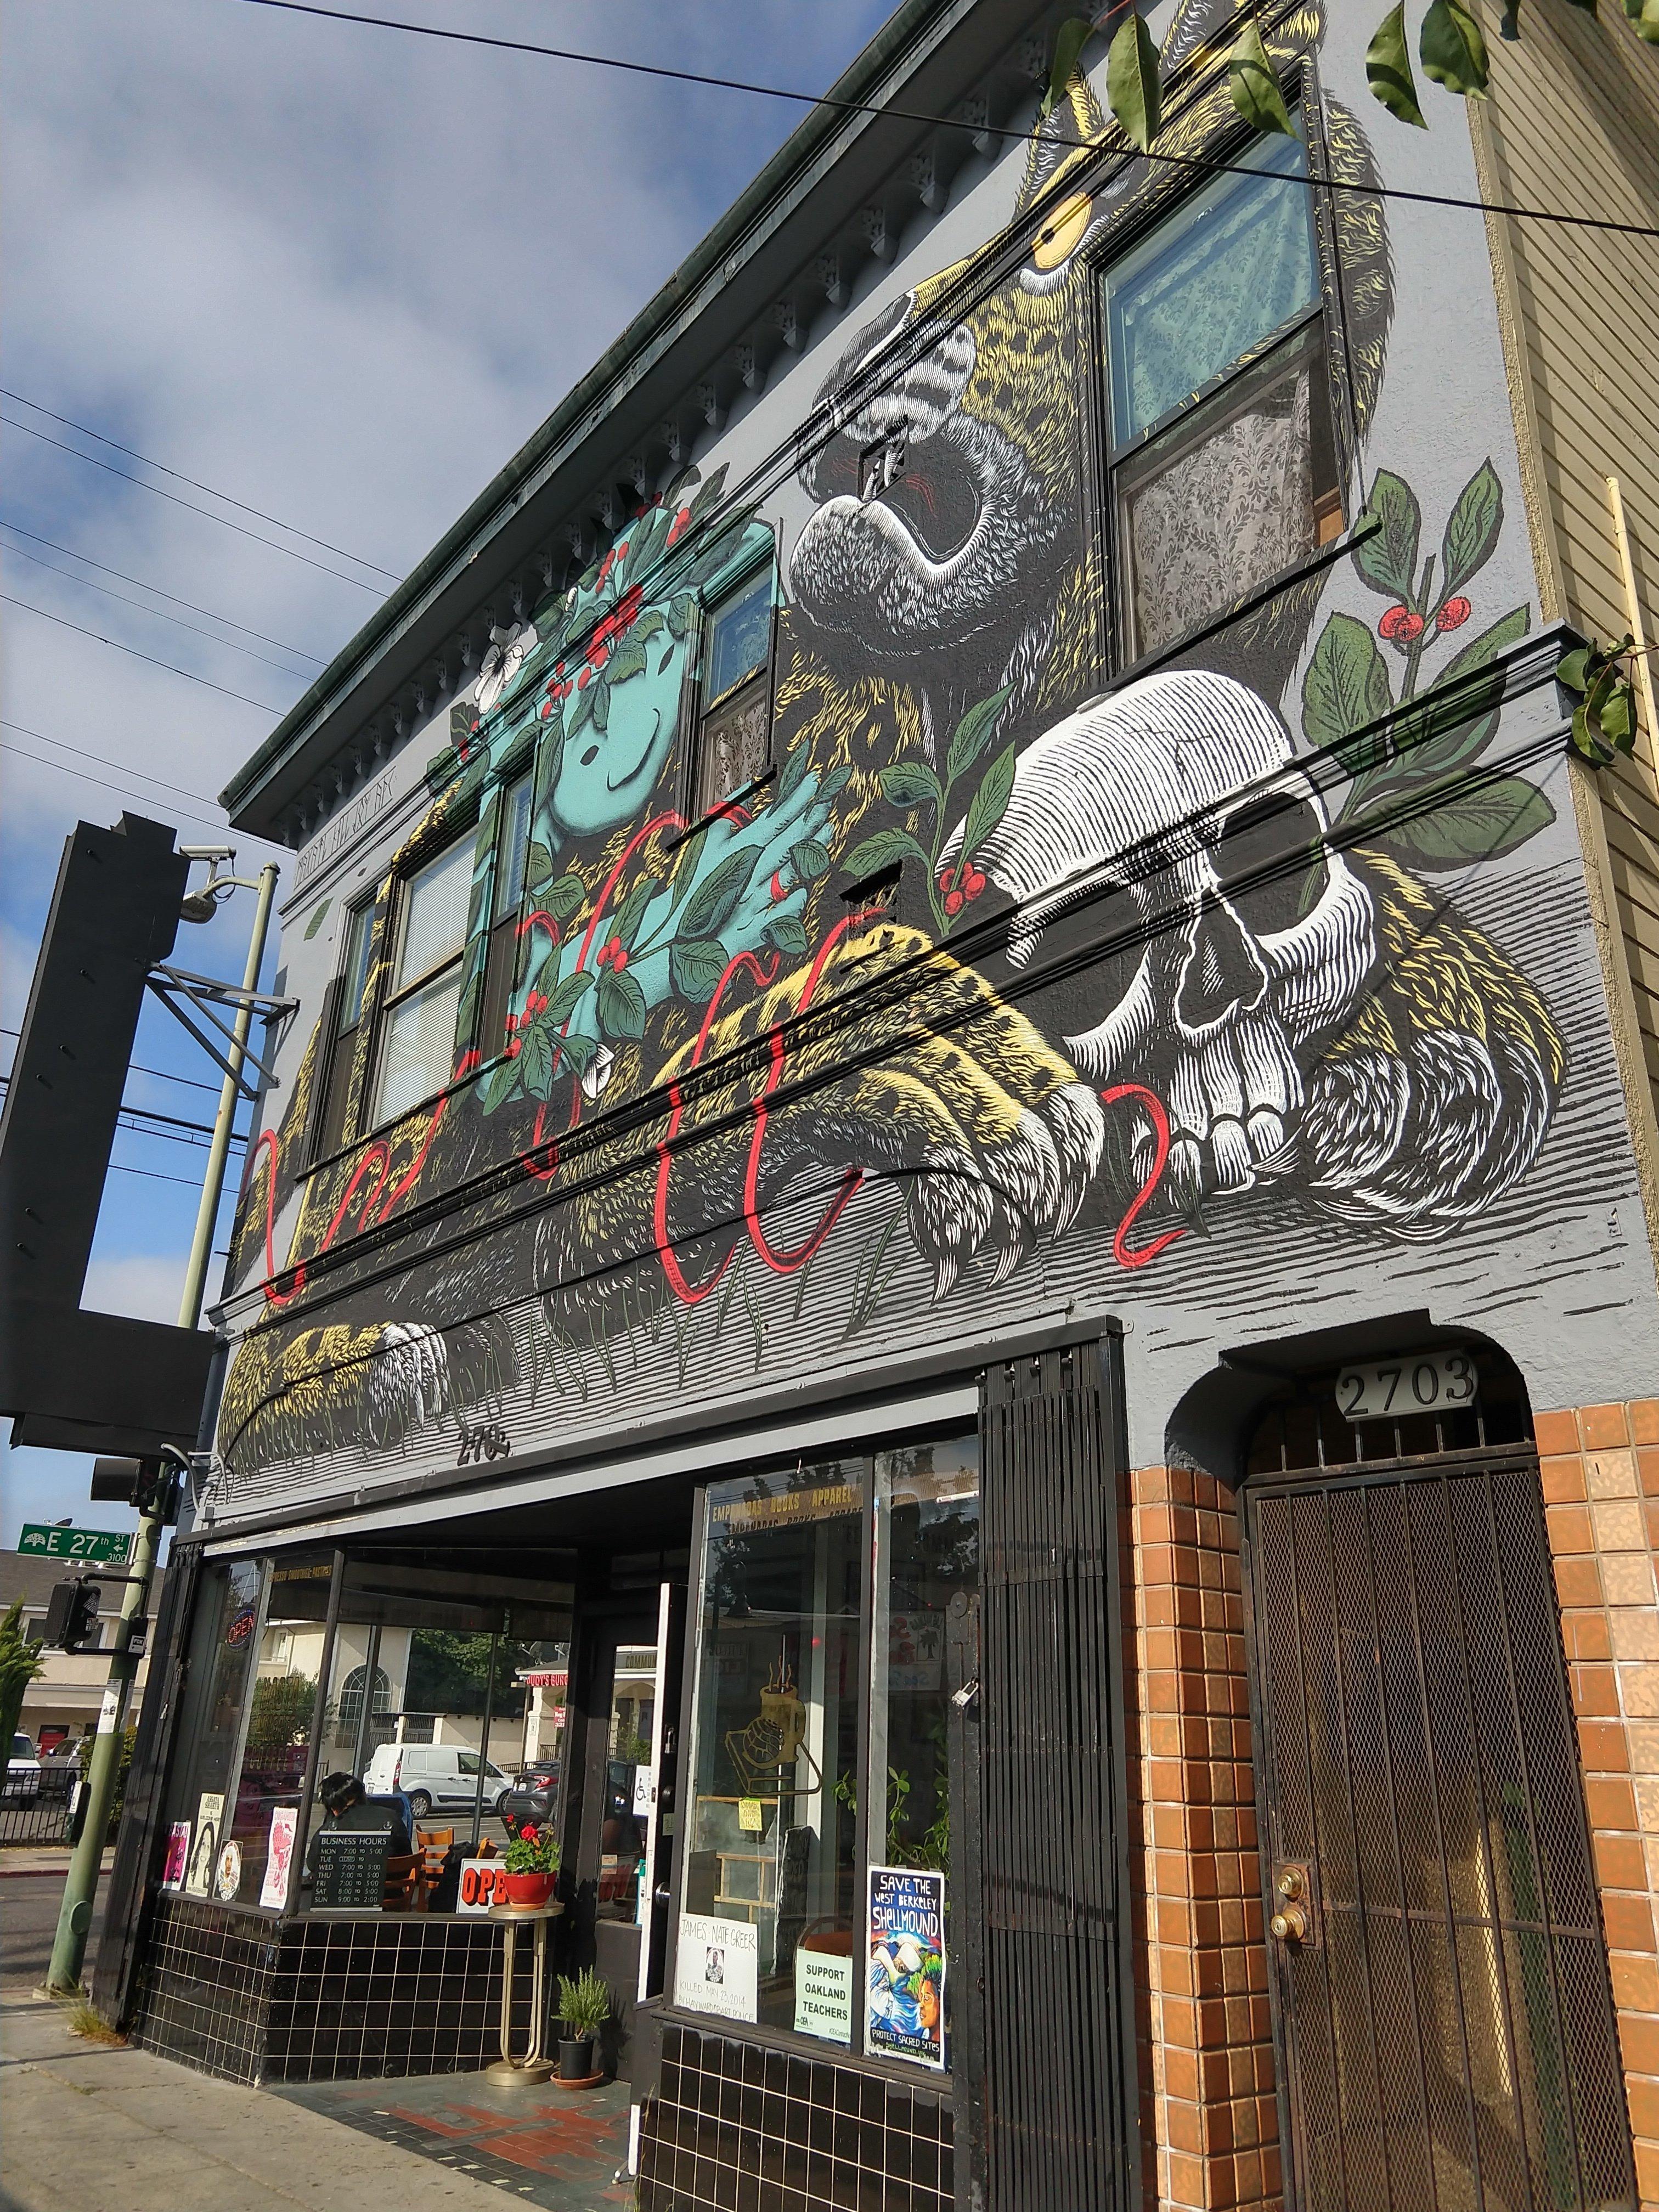 Hasta Muerte's storefront in Oakland, California.